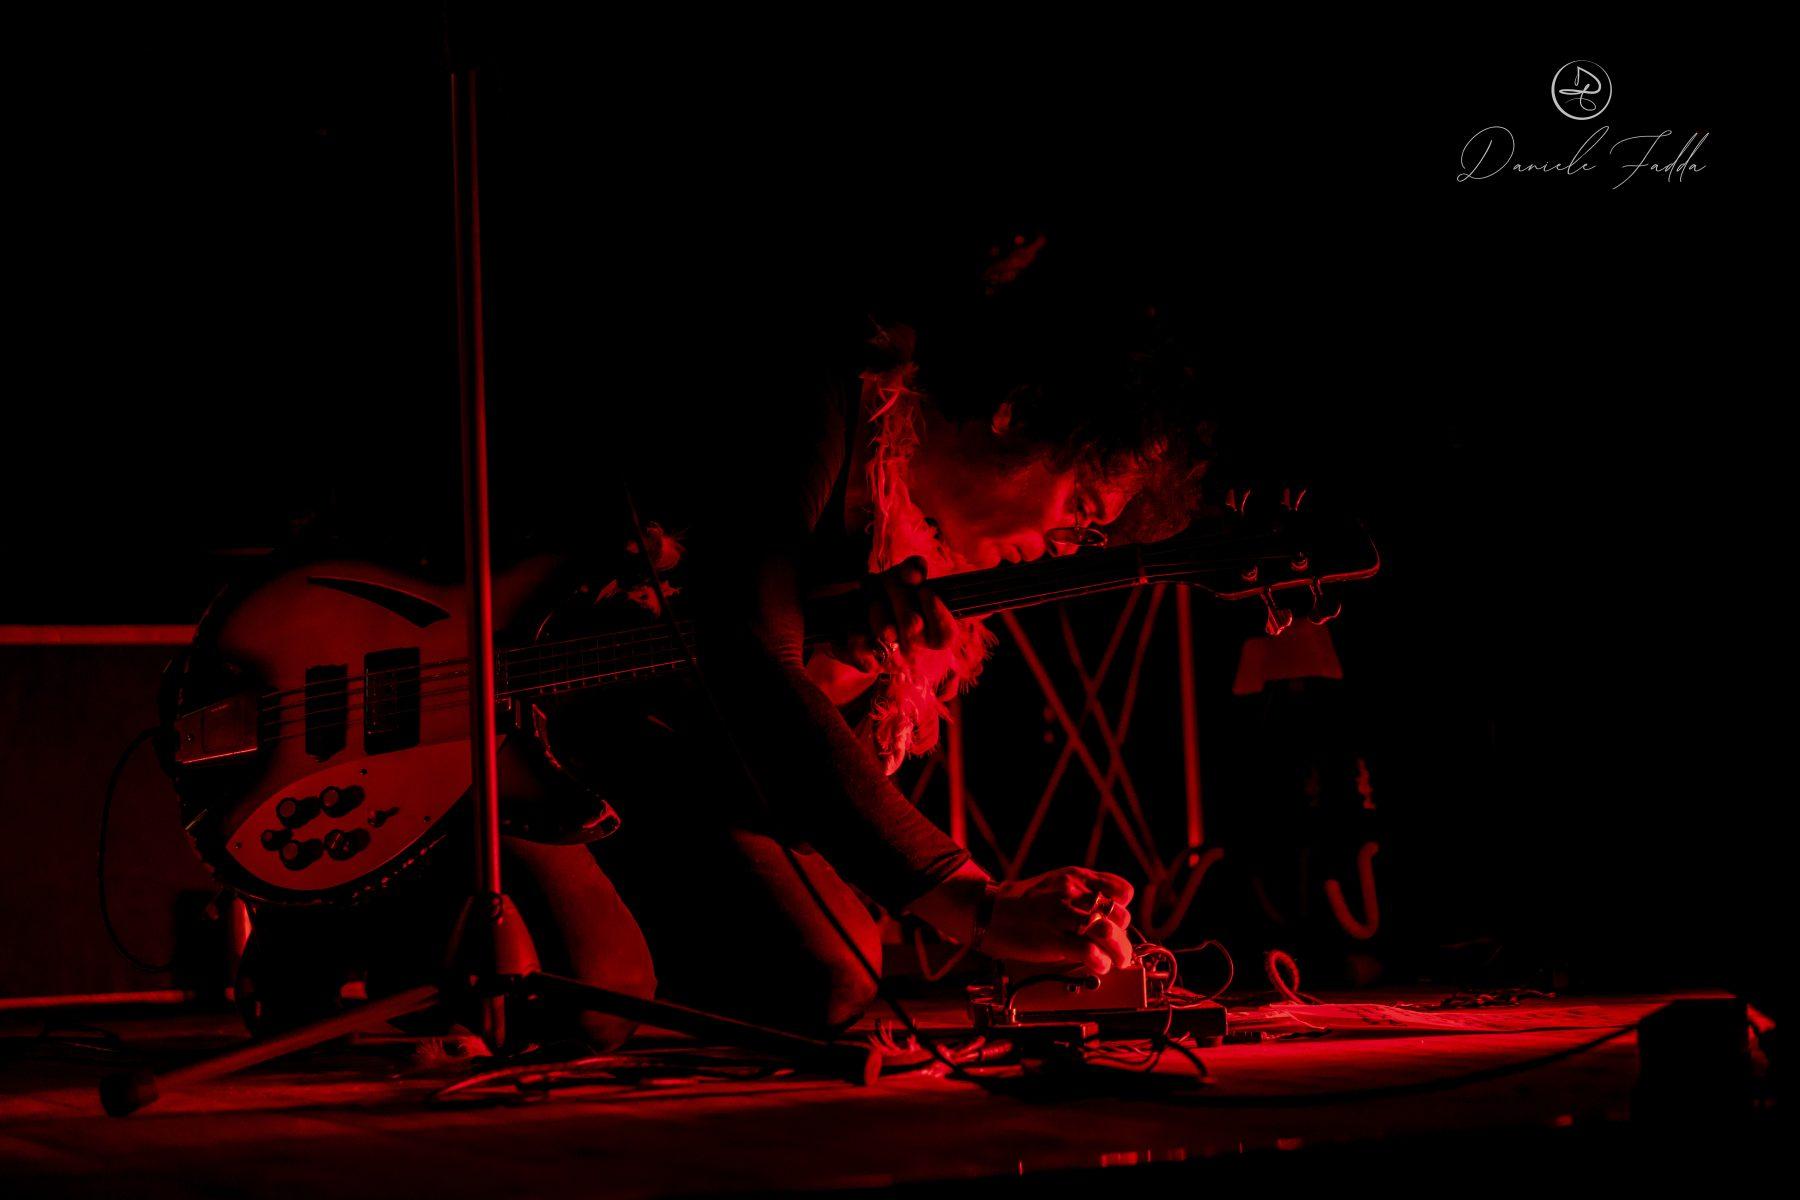 kme - live report - the winstons - daniele fadda - sa scena sarda - 2019 - karel music expo